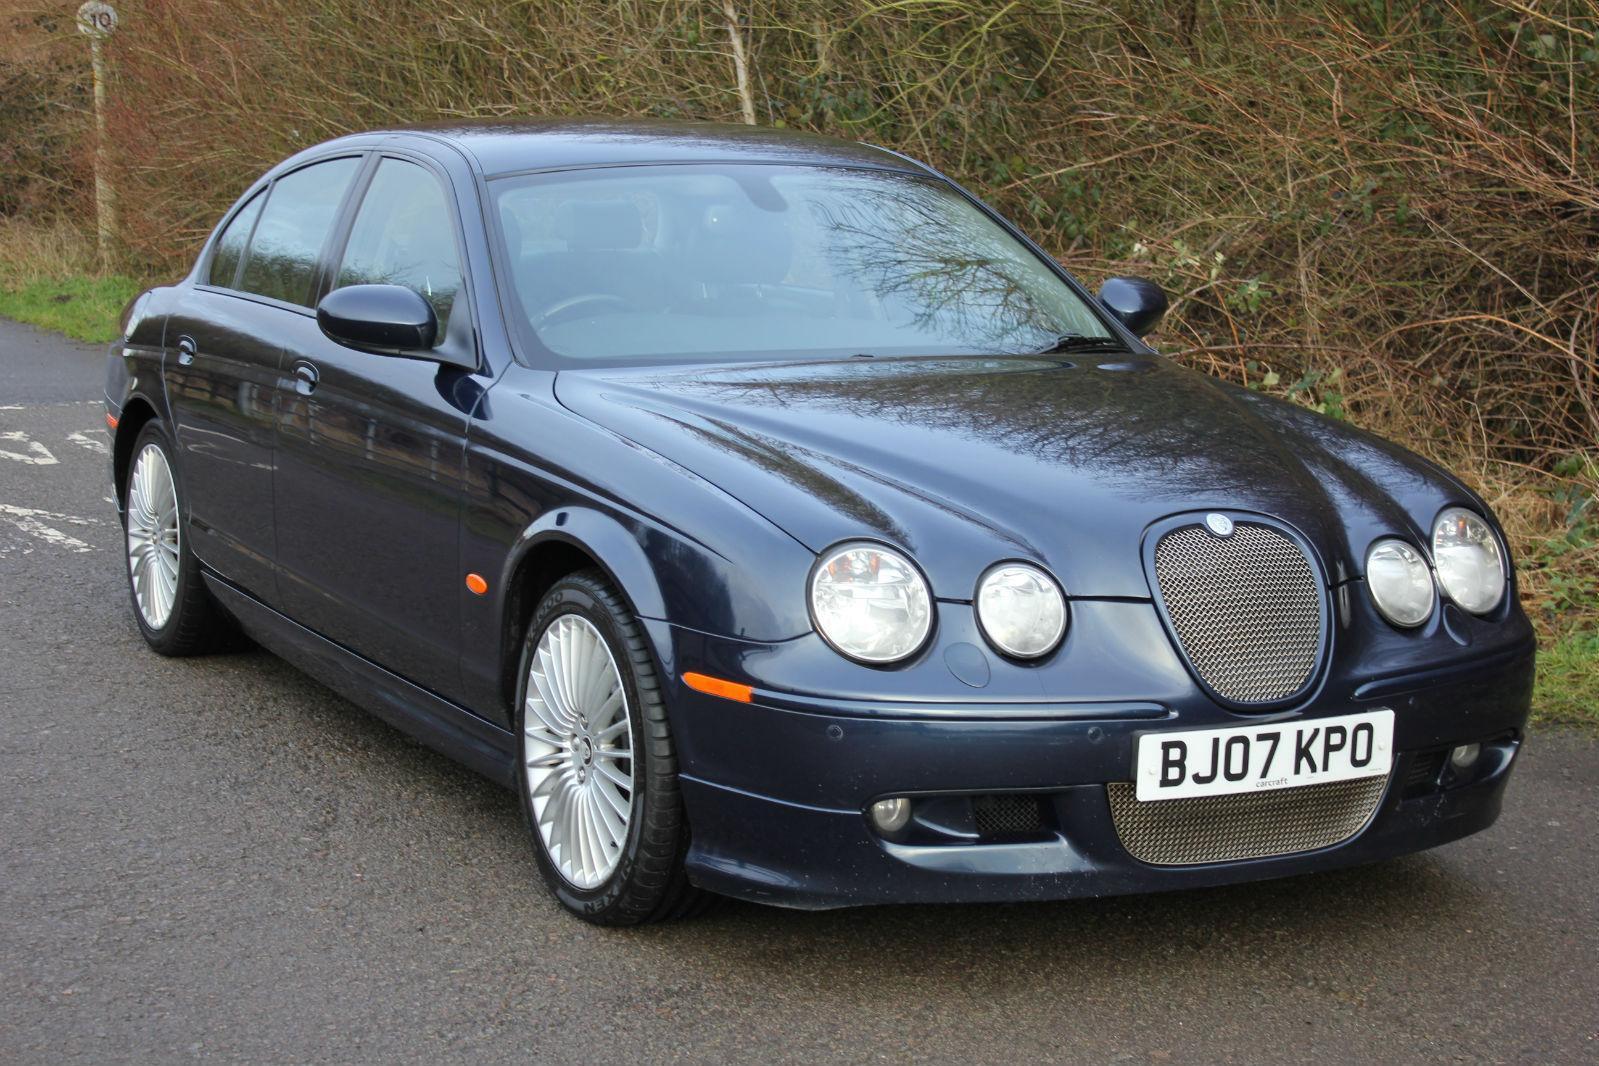 2007 jaguar s type 2 7d v6 auto xs for sale. Black Bedroom Furniture Sets. Home Design Ideas